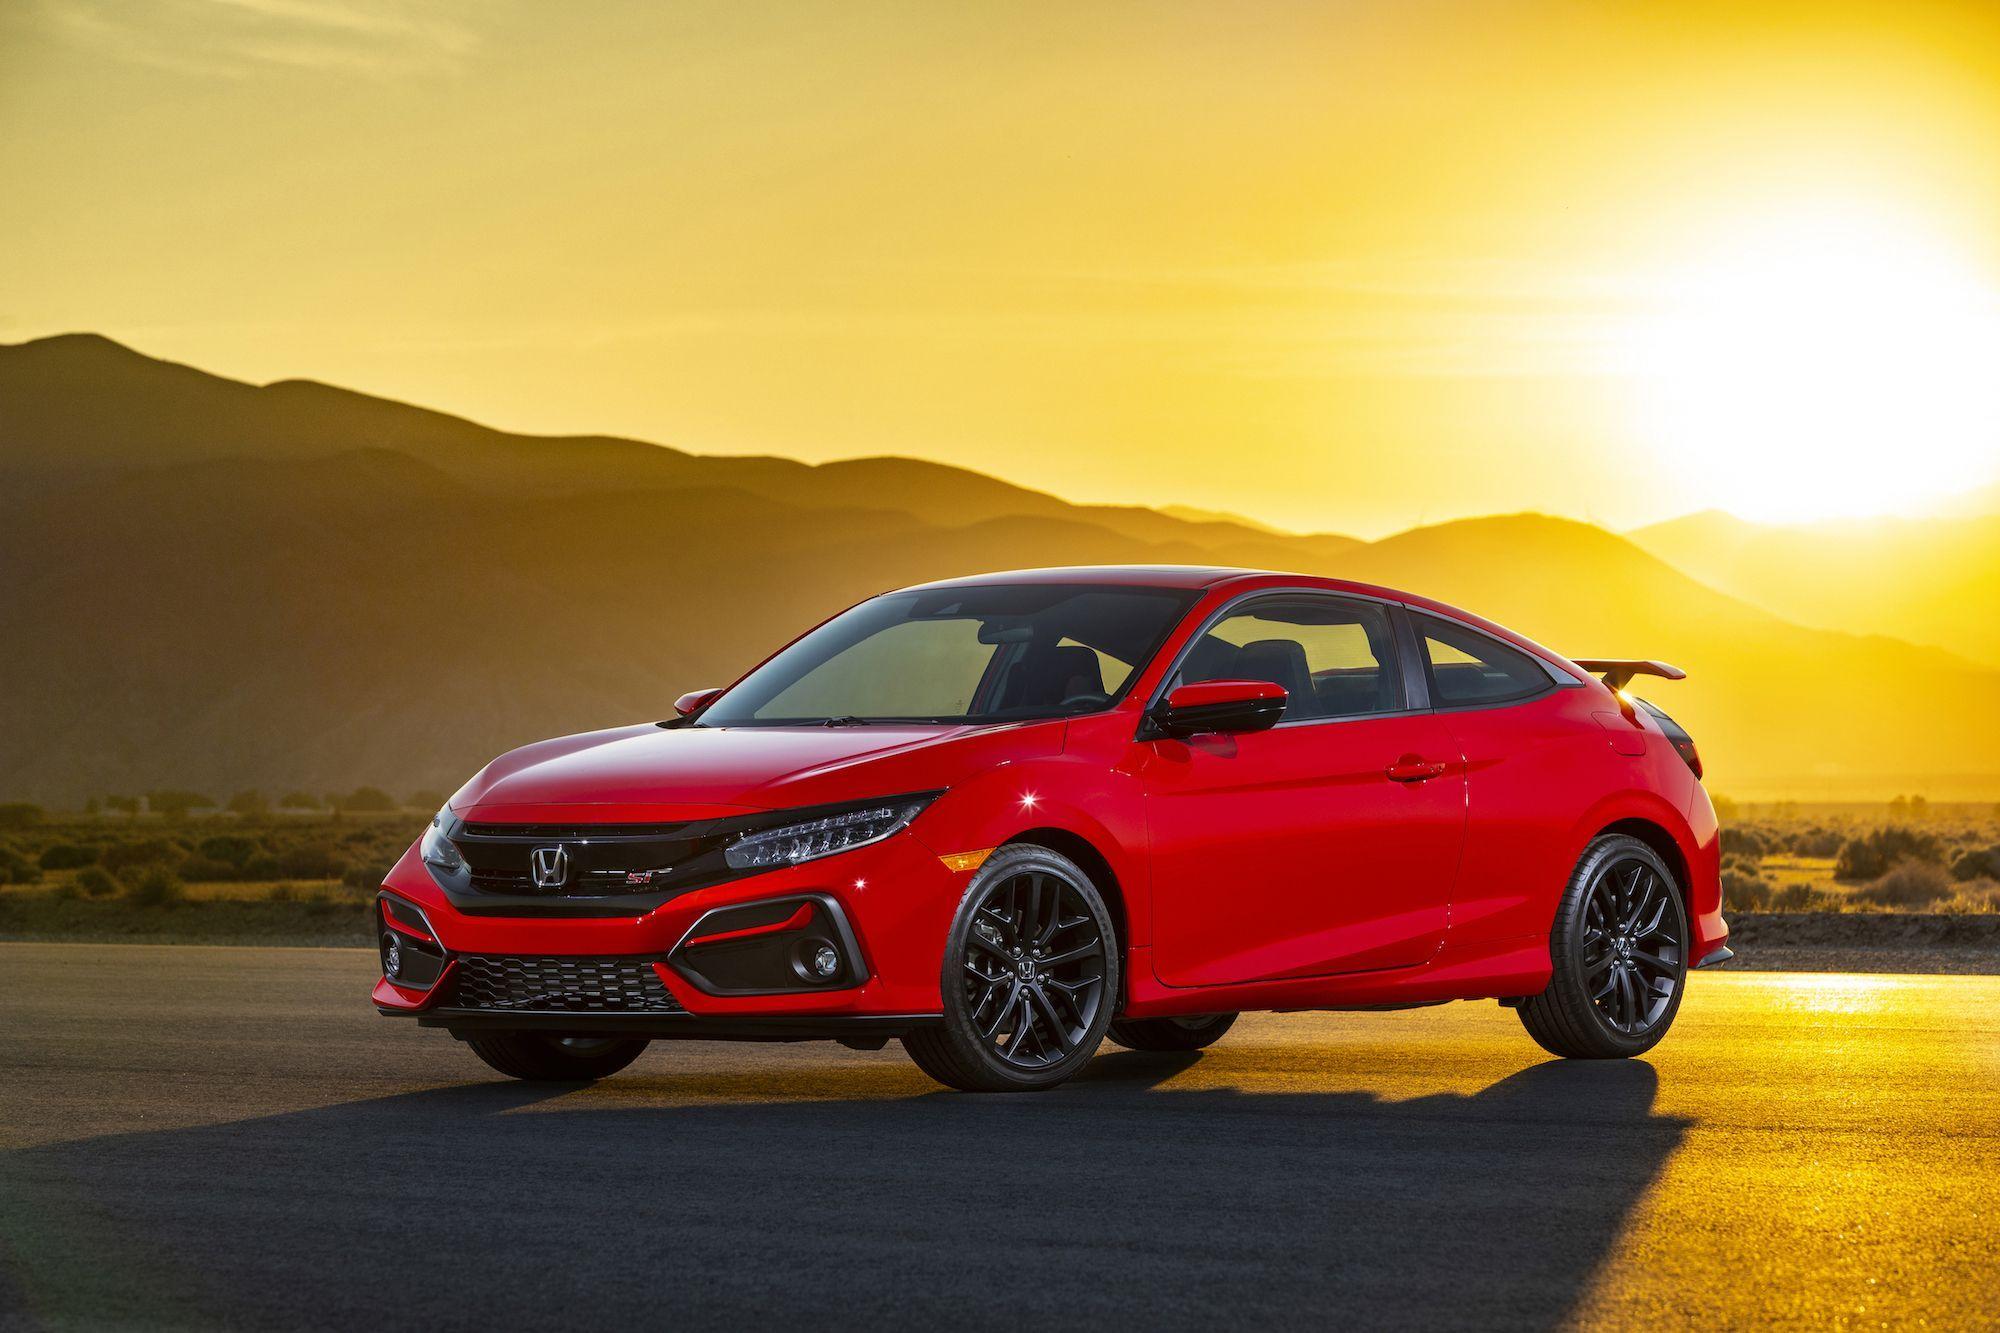 2020 Honda Accord Coupe Sedan In 2020 Honda Civic Si Honda Civic Coupe Honda Civic Si Coupe